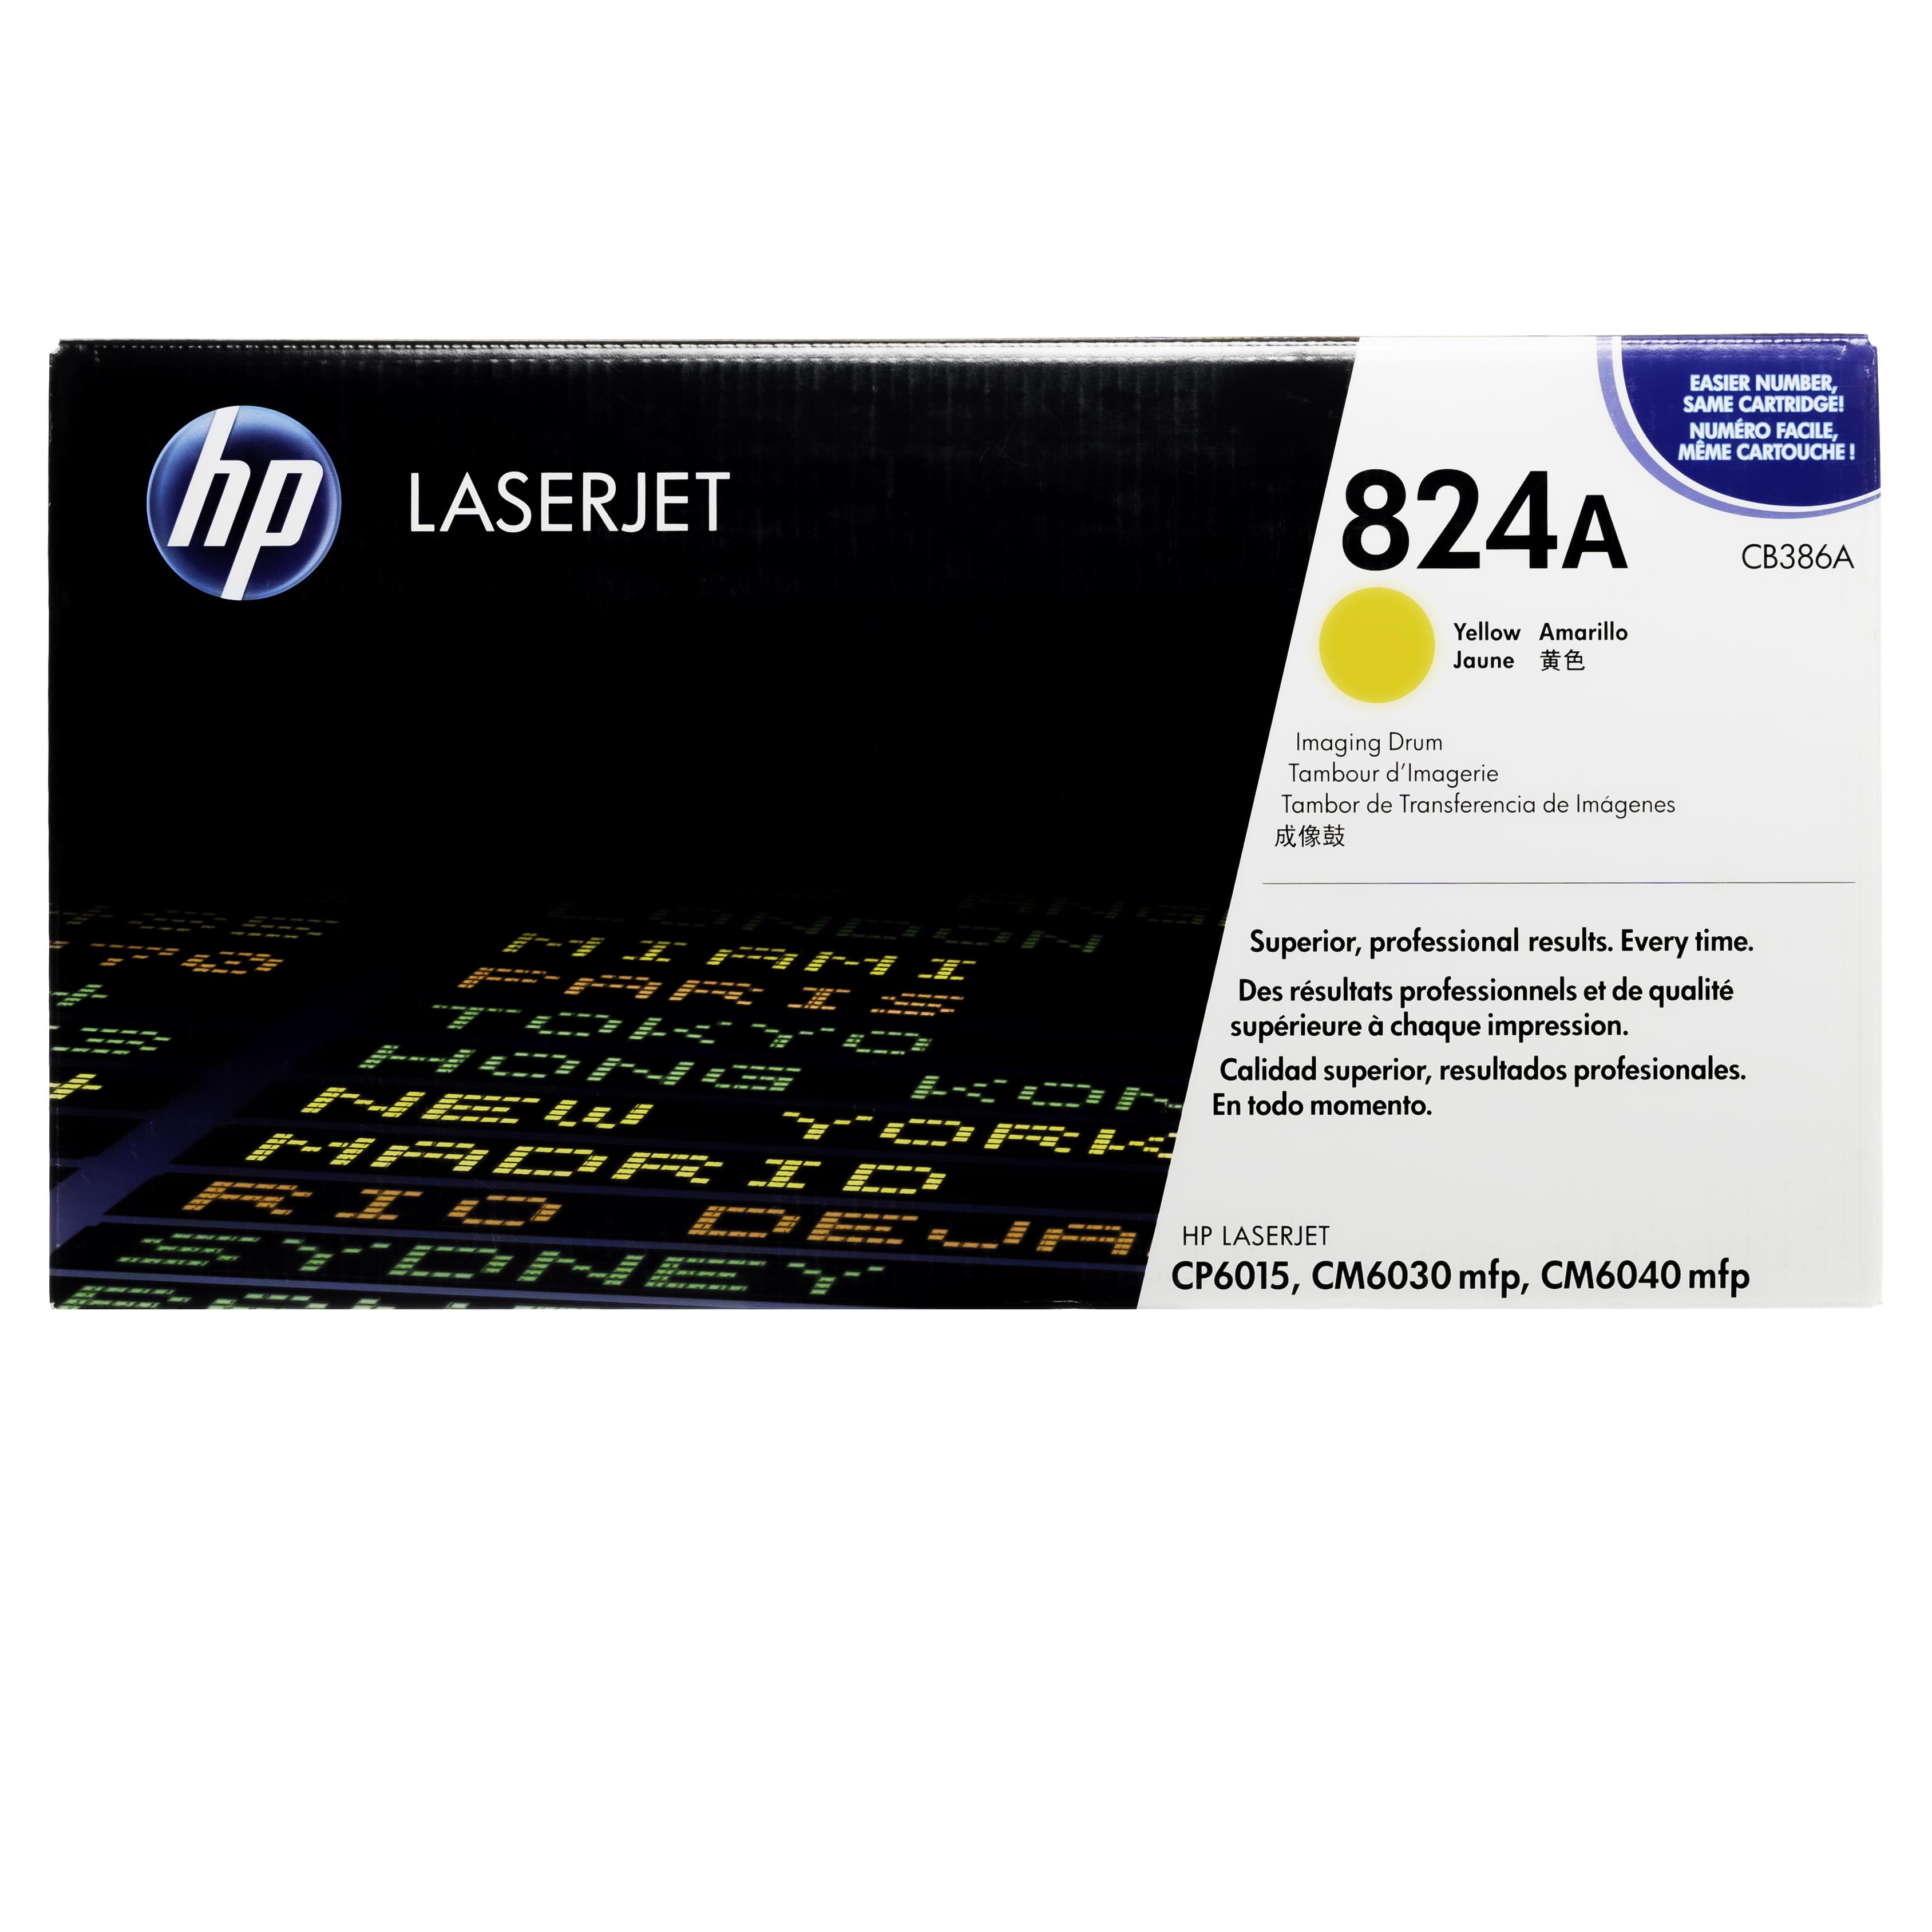 CB386A | HP 824A | Original HP Drum Unit – Yellow